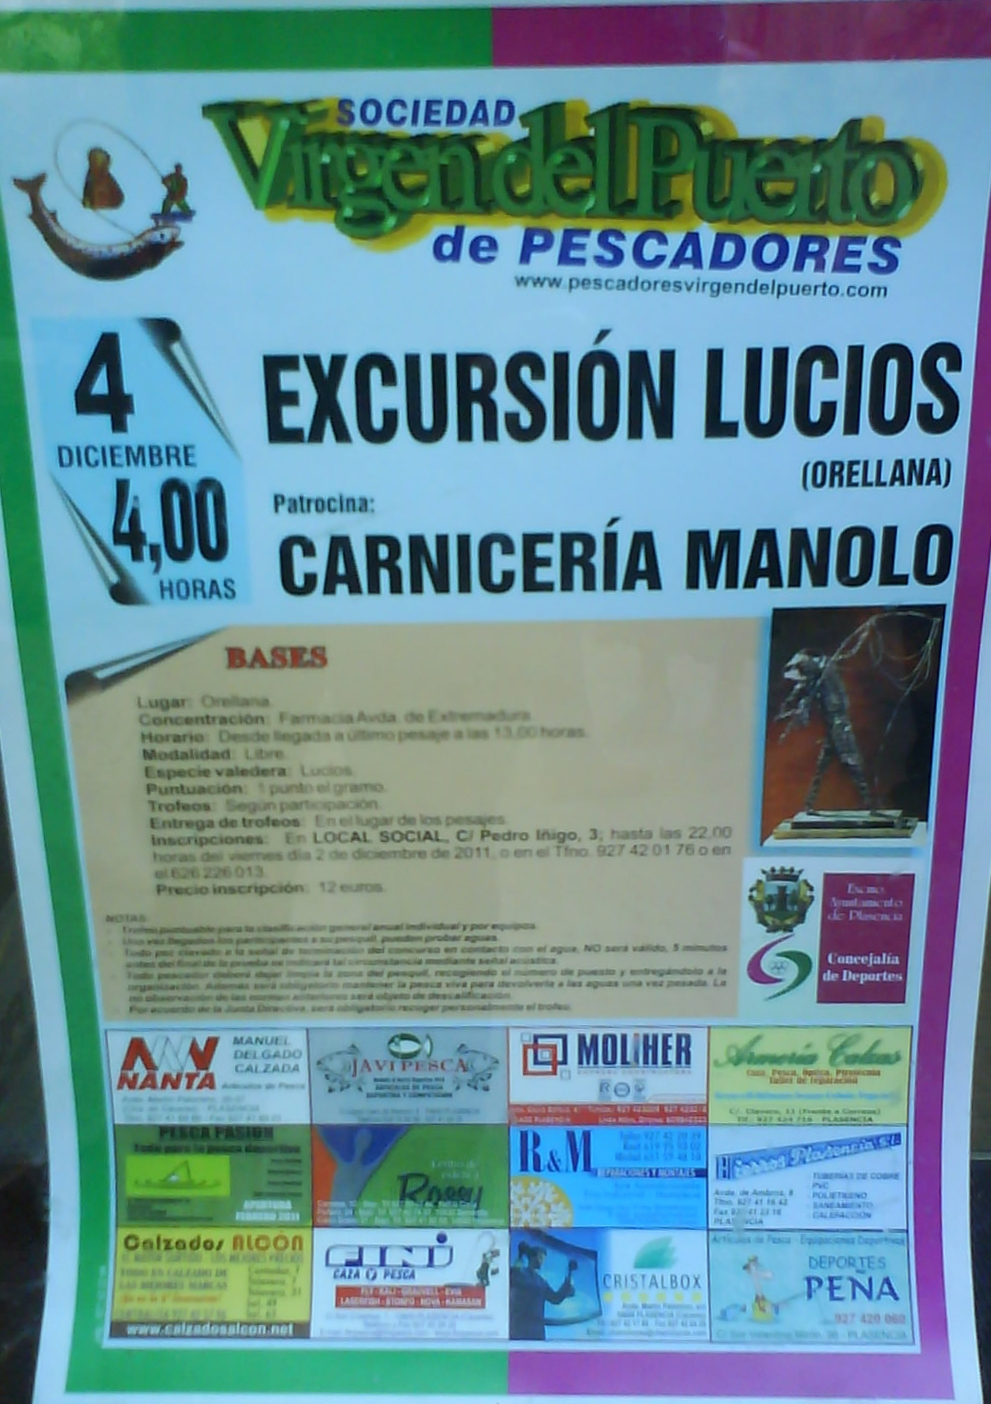 Turismo Plasencia Smartphone Noviembre 2011 # Muebles Sequeira Plasencia